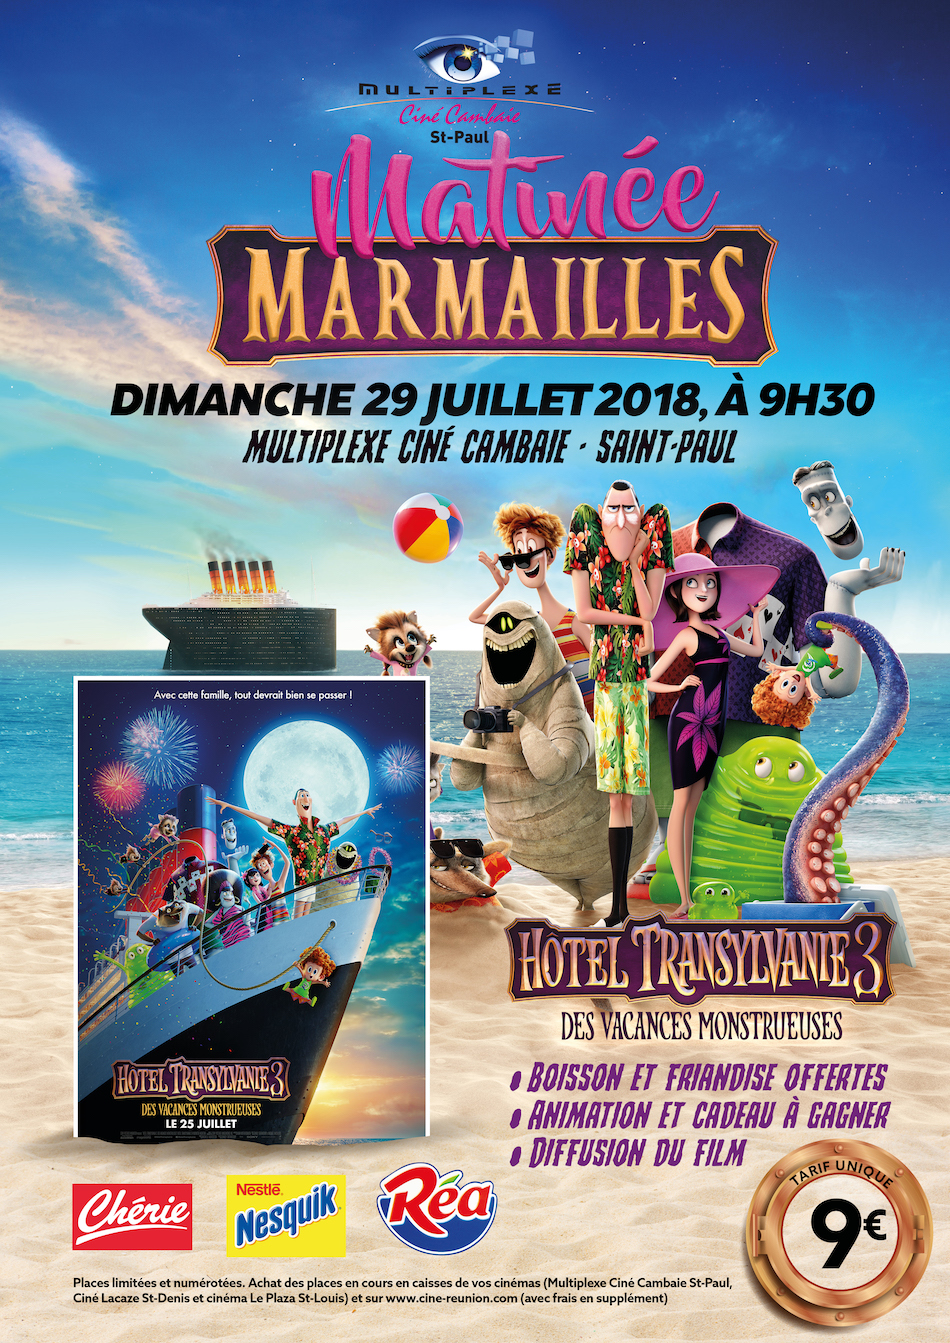 MATINEE MARMAILLES HOTEL TRANSYLVANIE